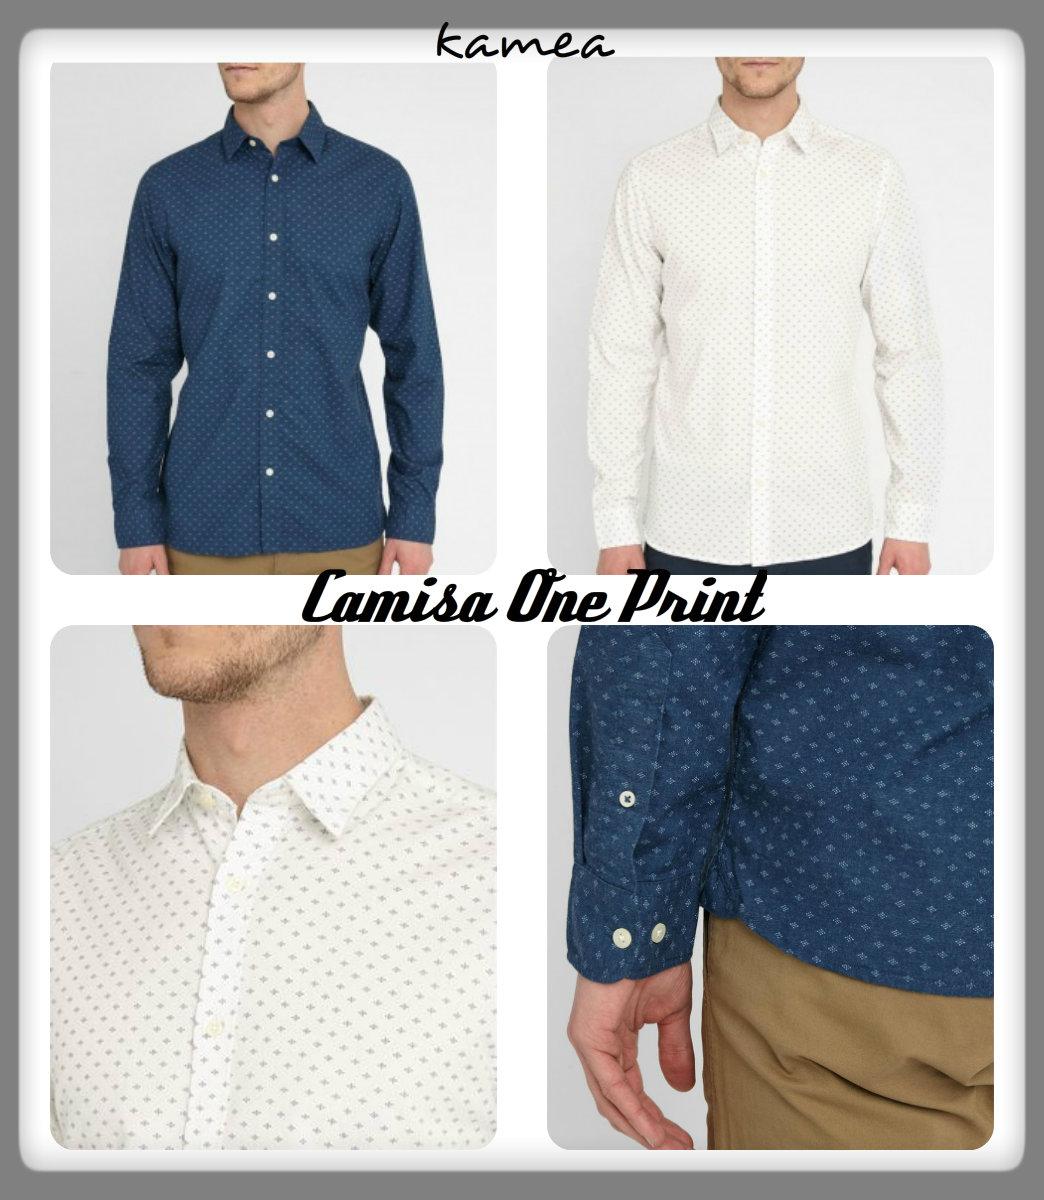 camisa one print